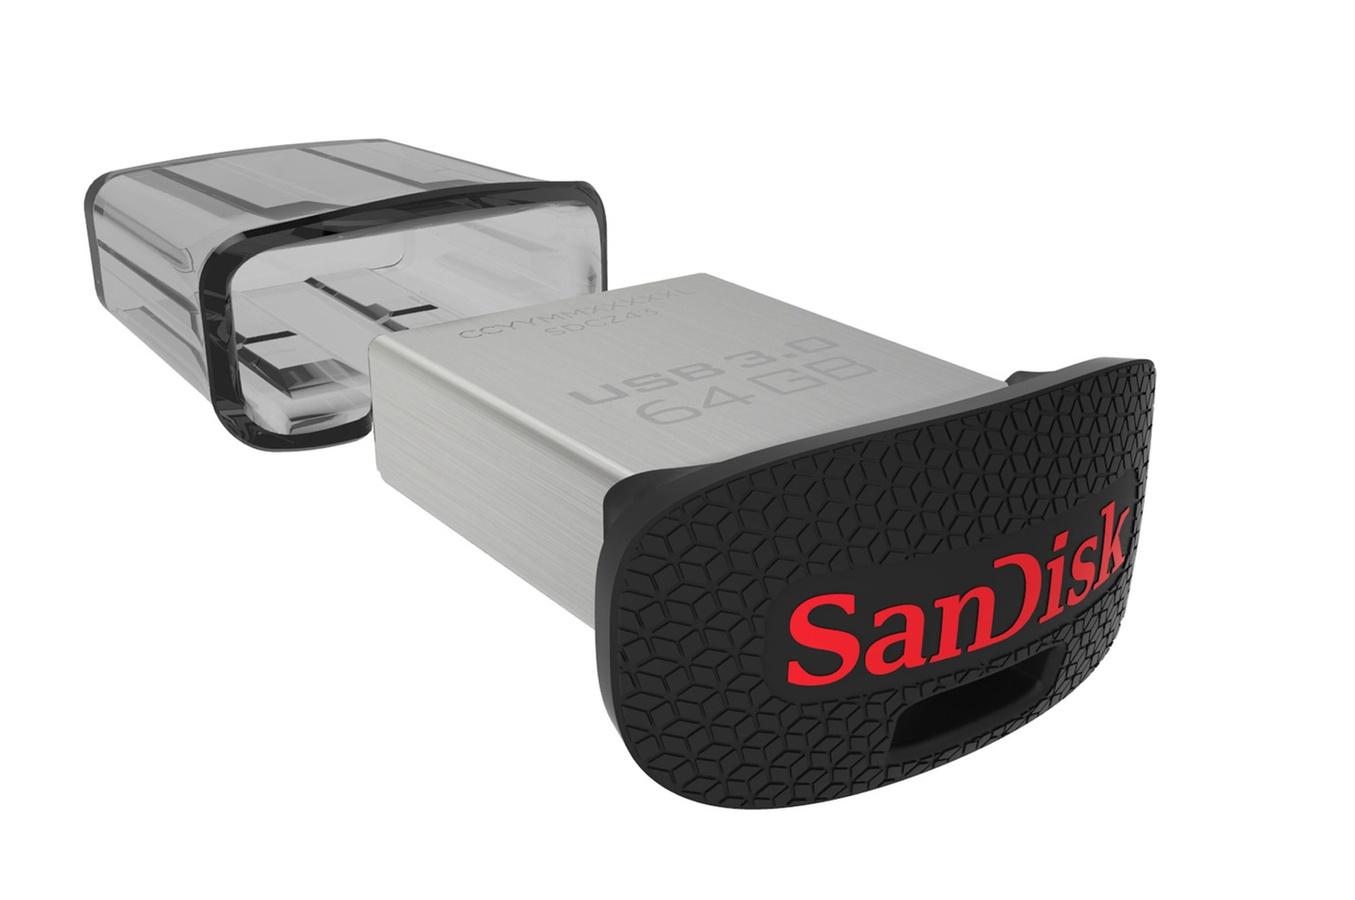 Sandisk Ultra Fit 64GB Flash Drive (SDCZ43-064G-GAM46)